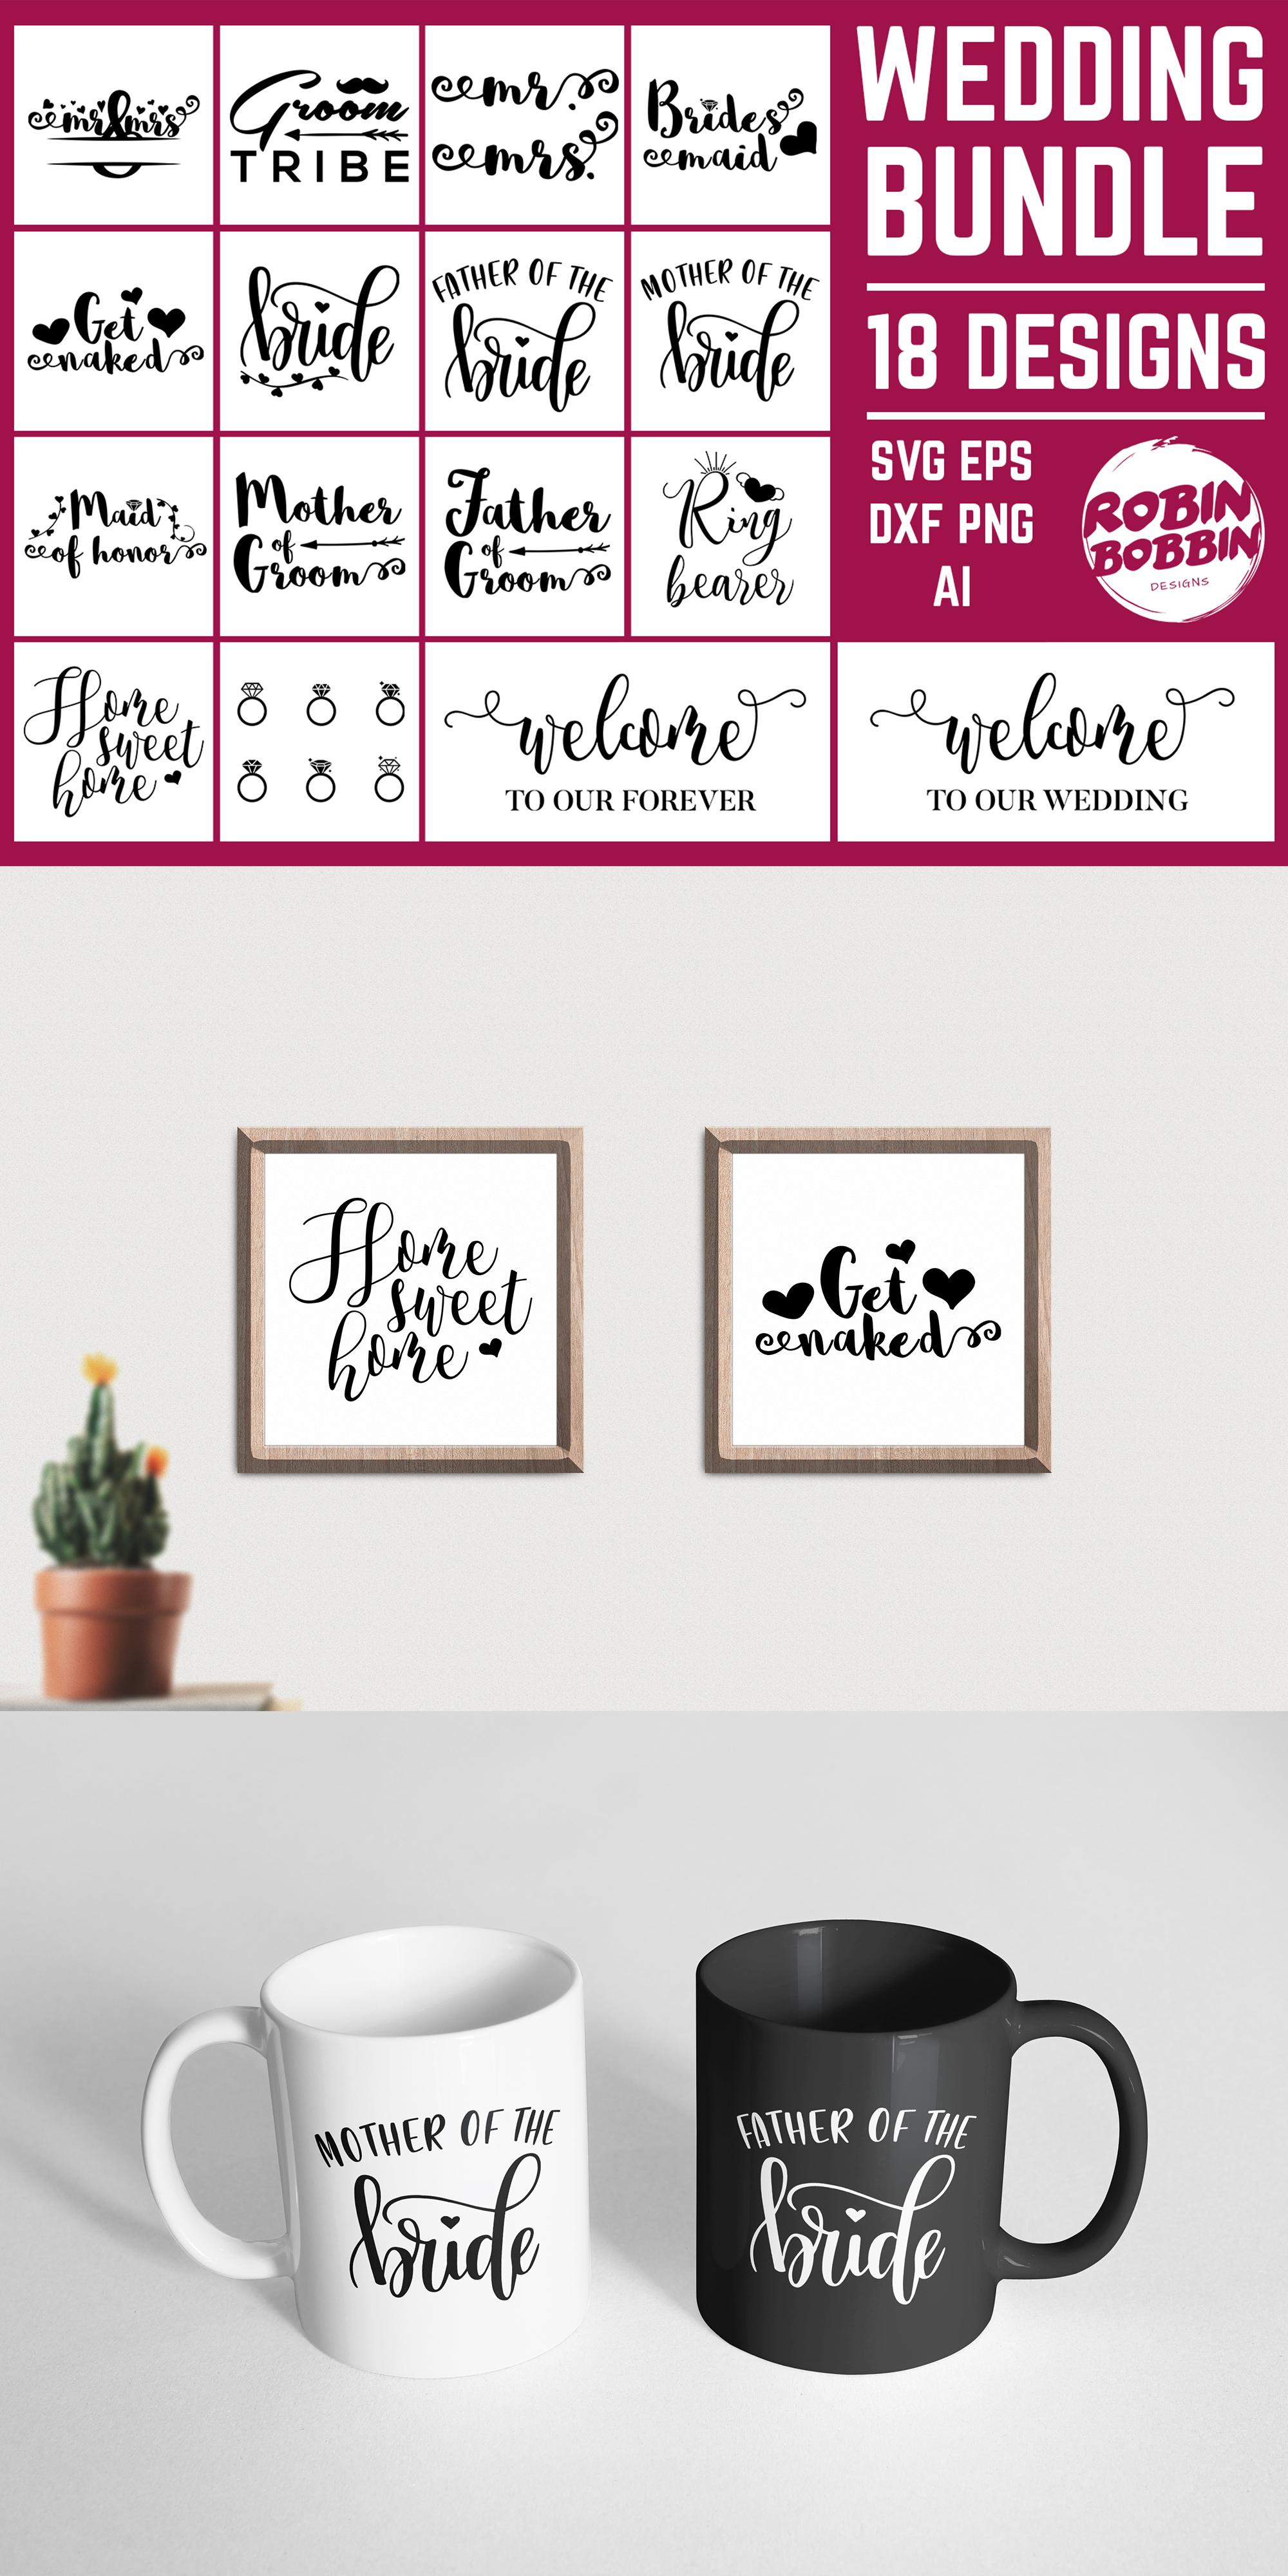 Wedding Bundle 18 Designs SVG Files - Wedding Set SVG EPS AI example image 7